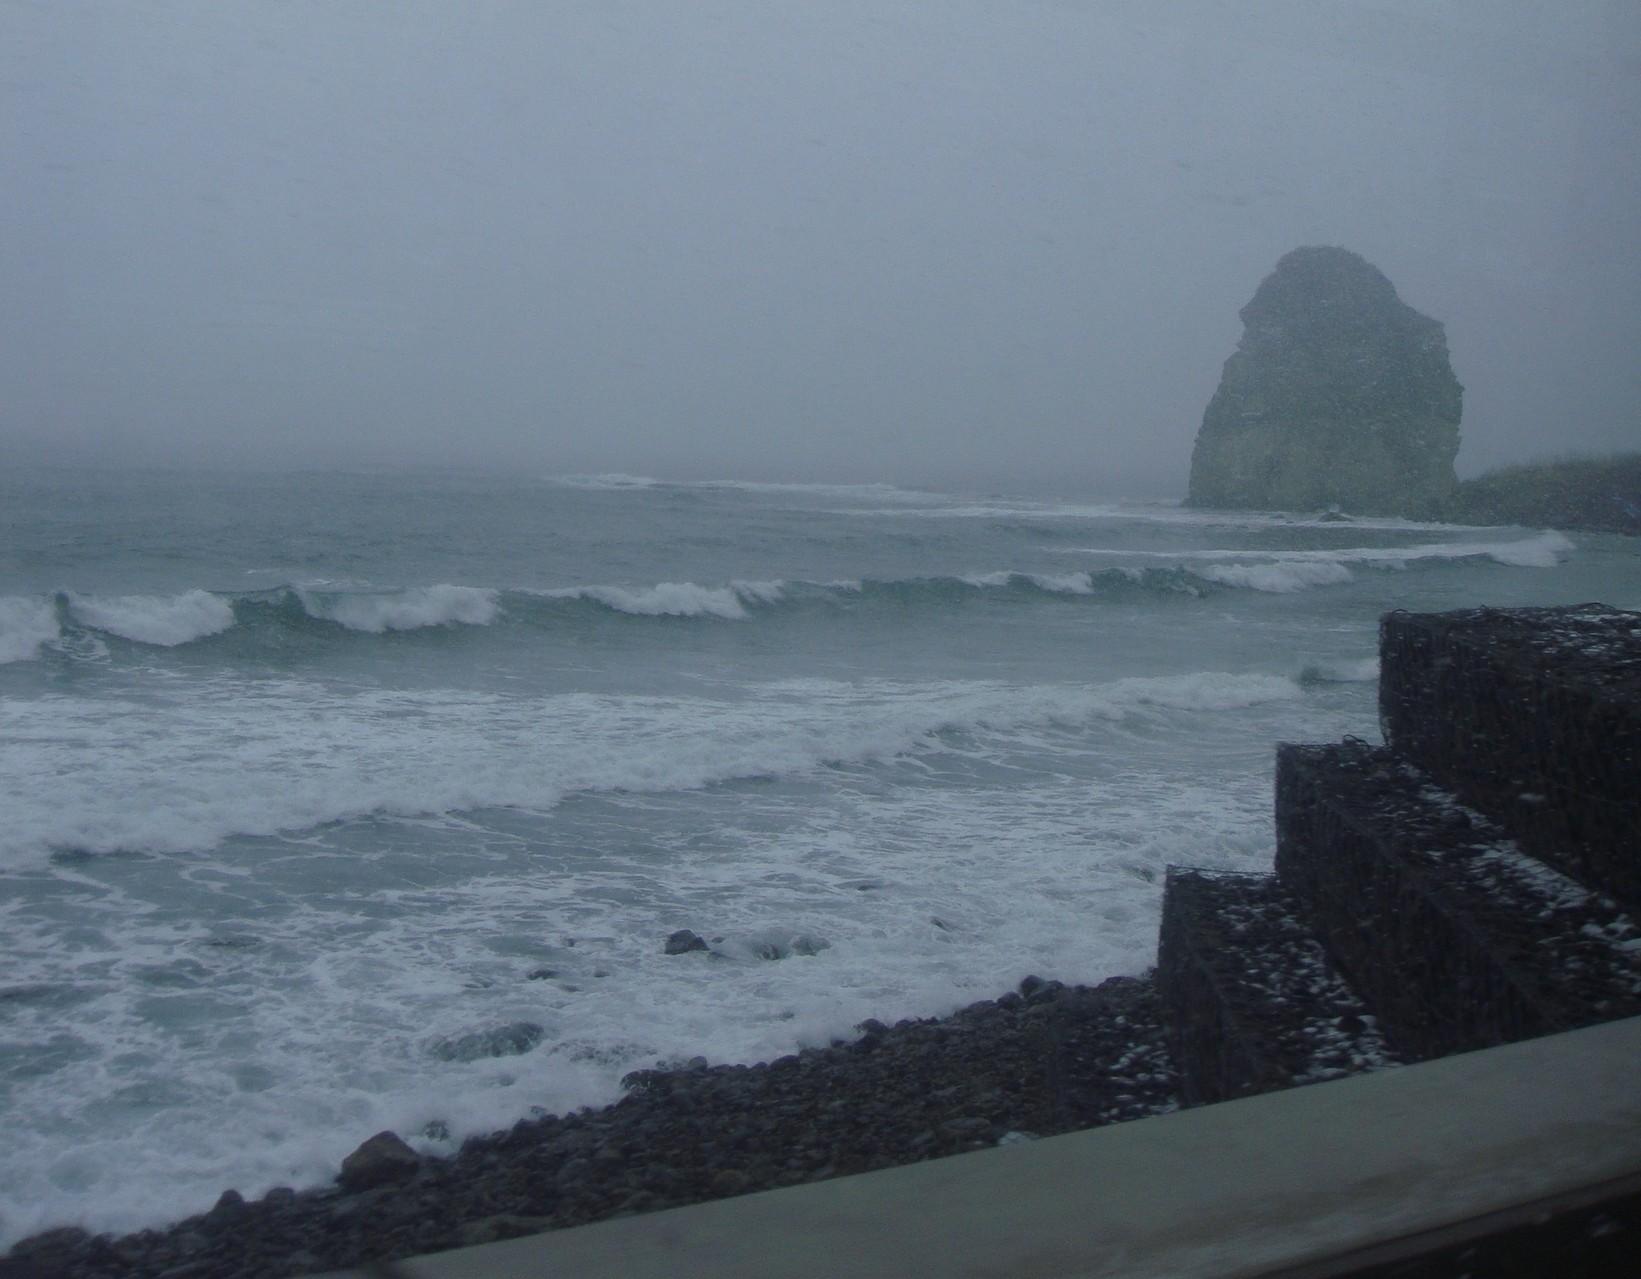 At Iwanai town, Hokkaido. Shivering winter. Went for obtaining deep seawater.